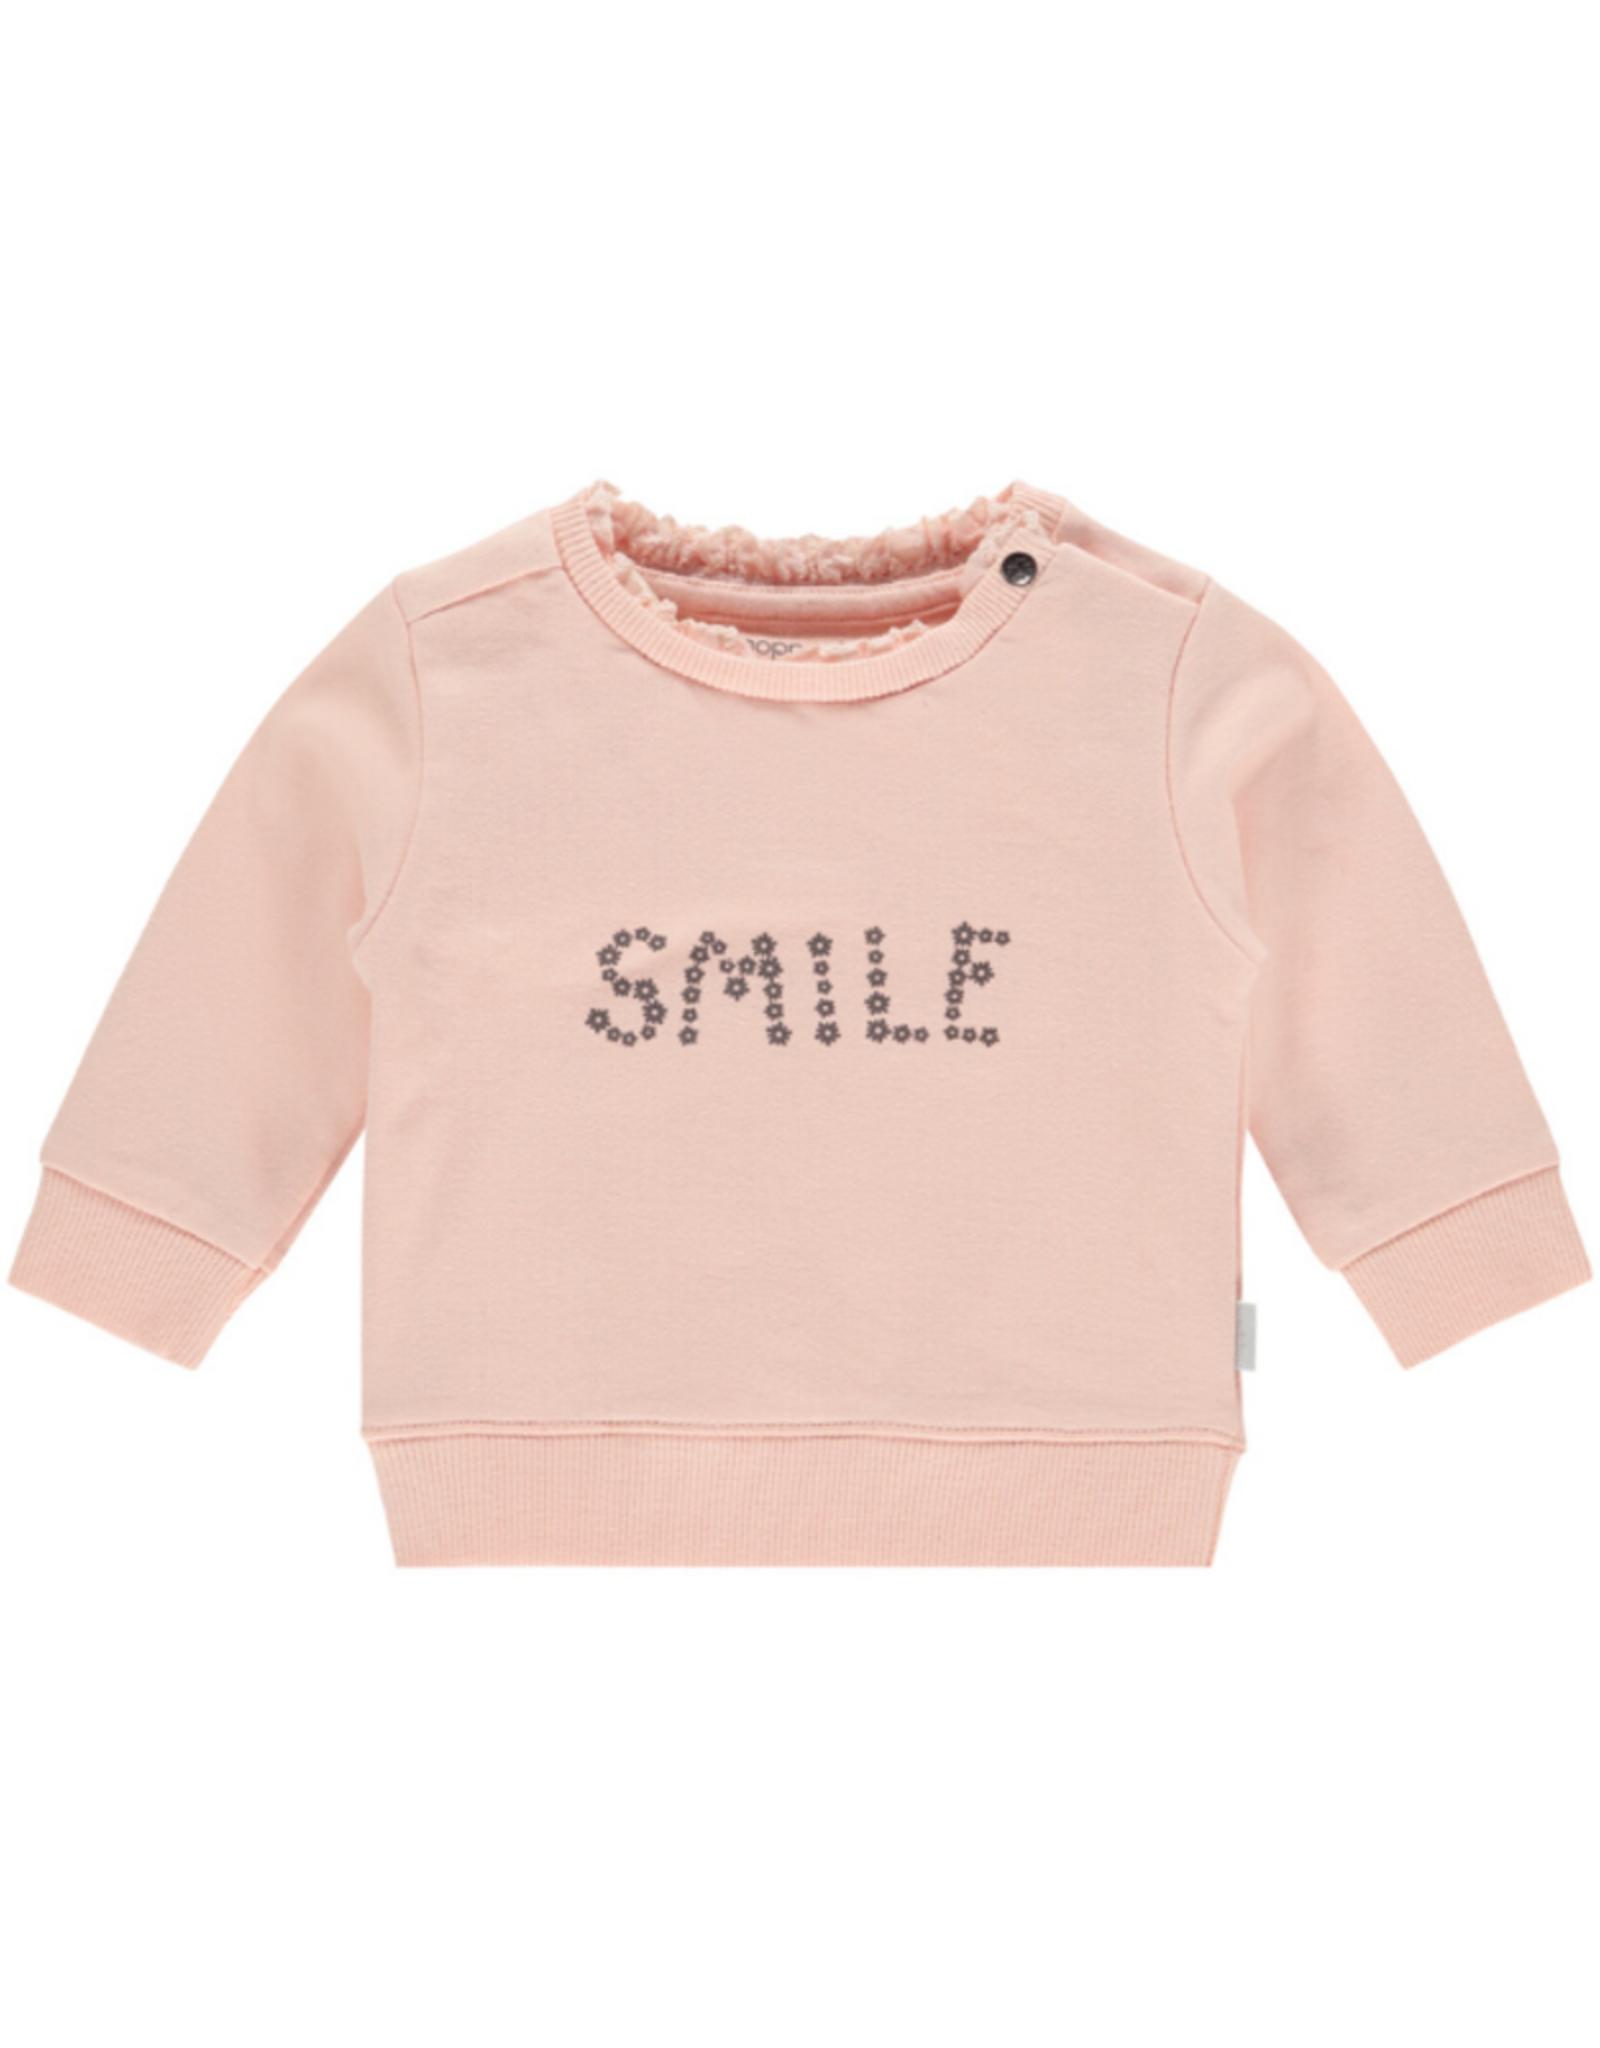 Noppies Smile sweater